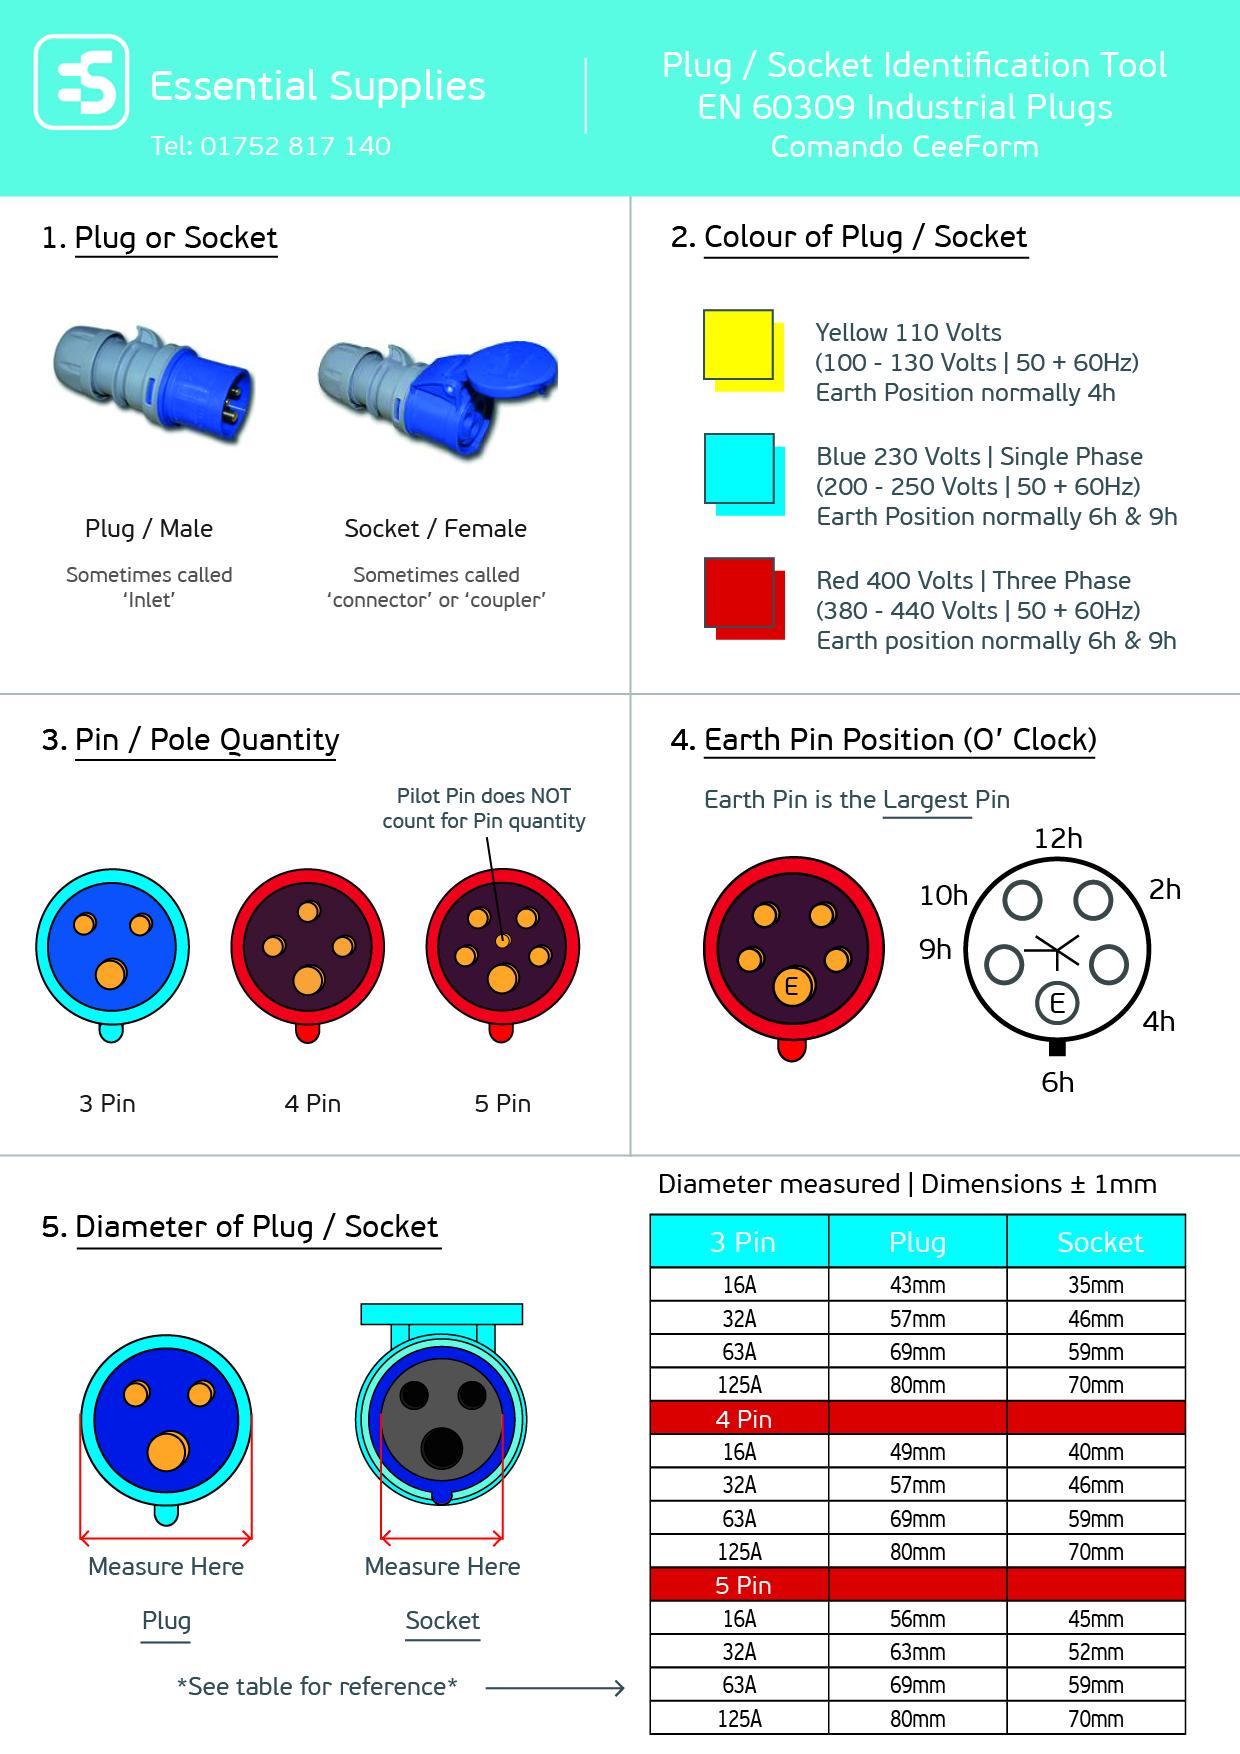 Plug and Socket Indentification